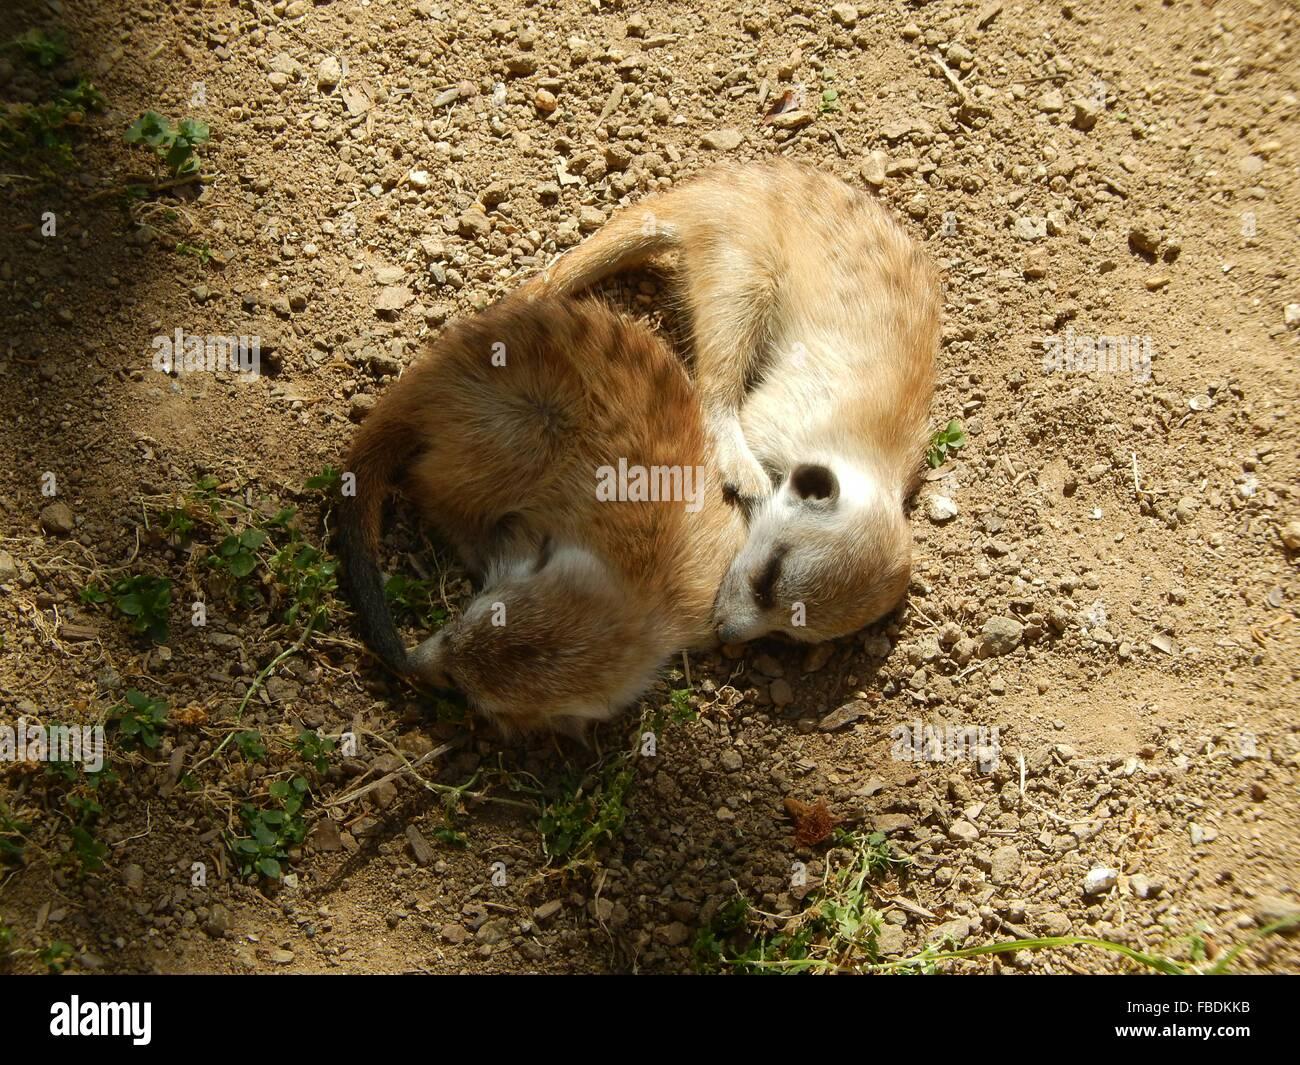 Meerkats Sleeping - Stock Image